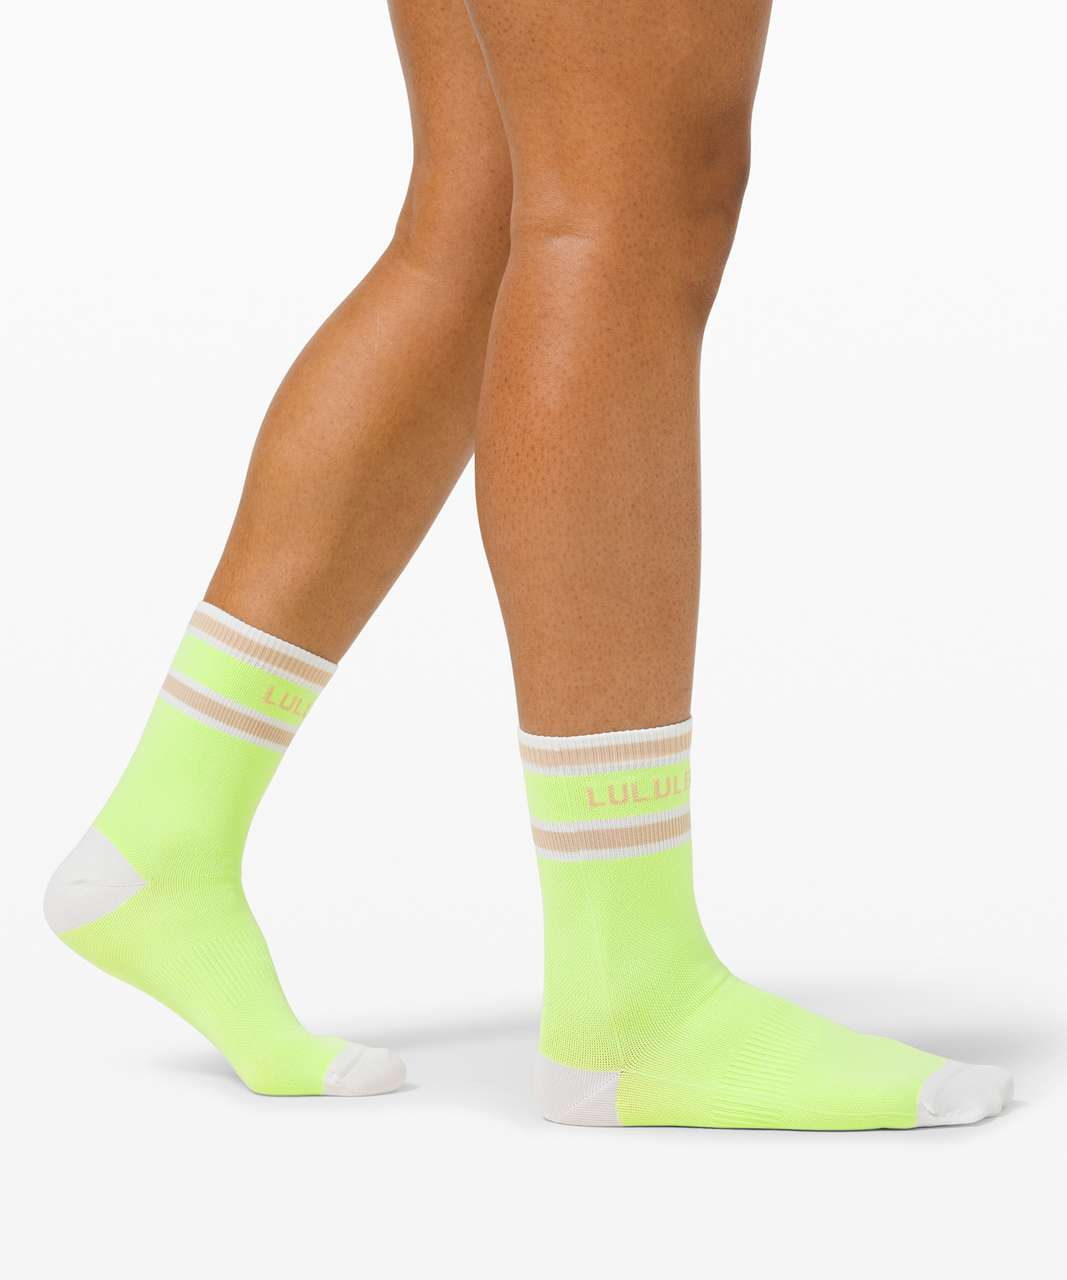 Lululemon Tale To Tell Quarter Sock *2 Pack - White / Neo Mint / Cafe Au Lait